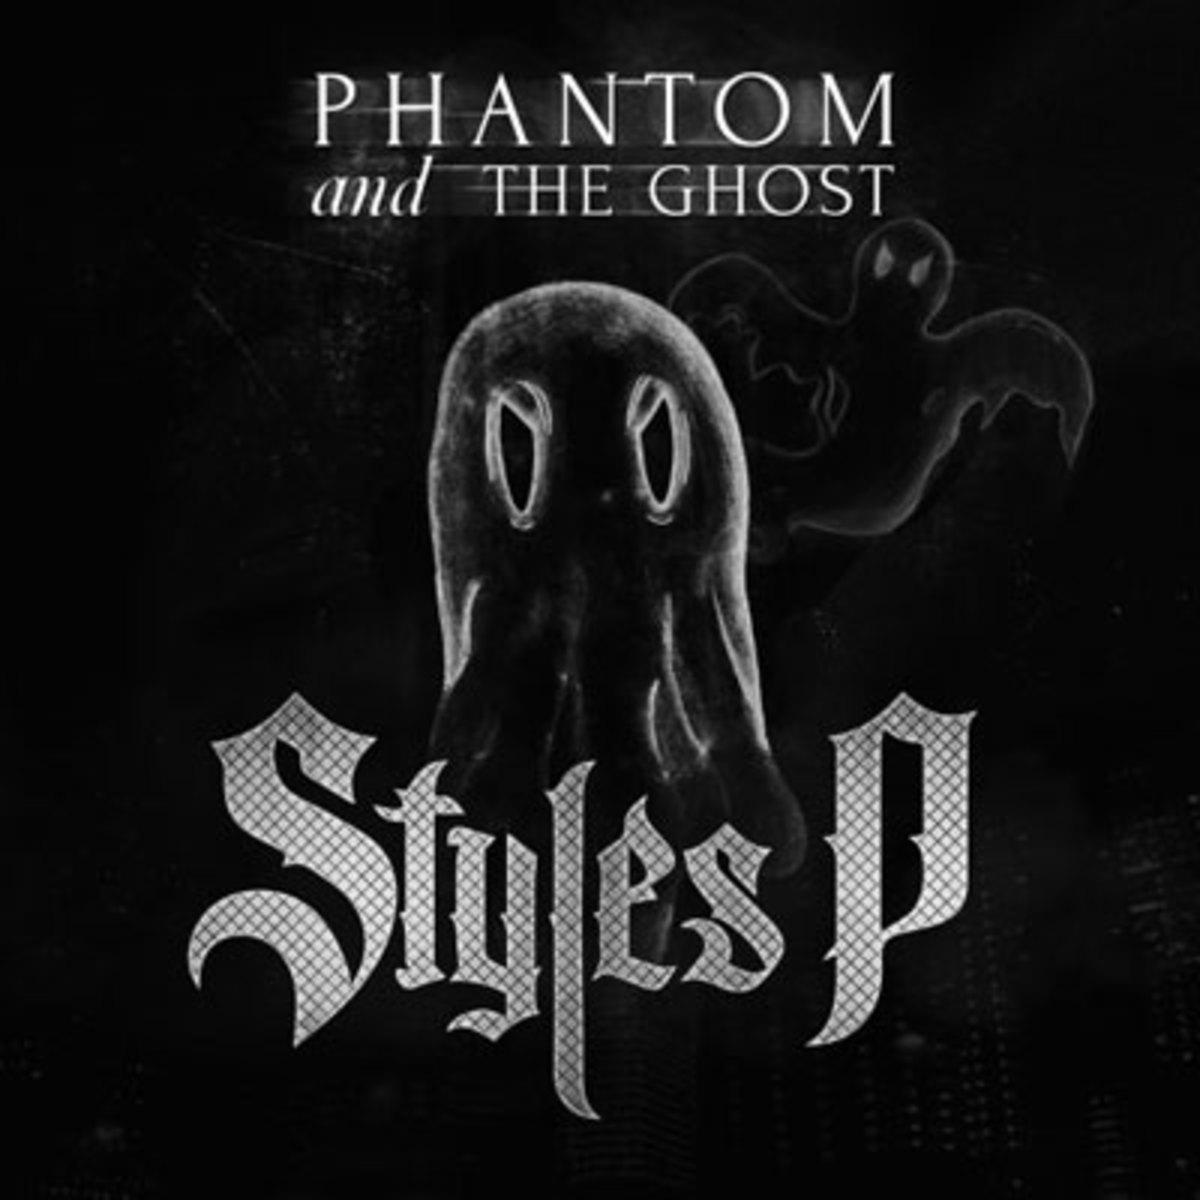 stylesp-phantomghost.jpg